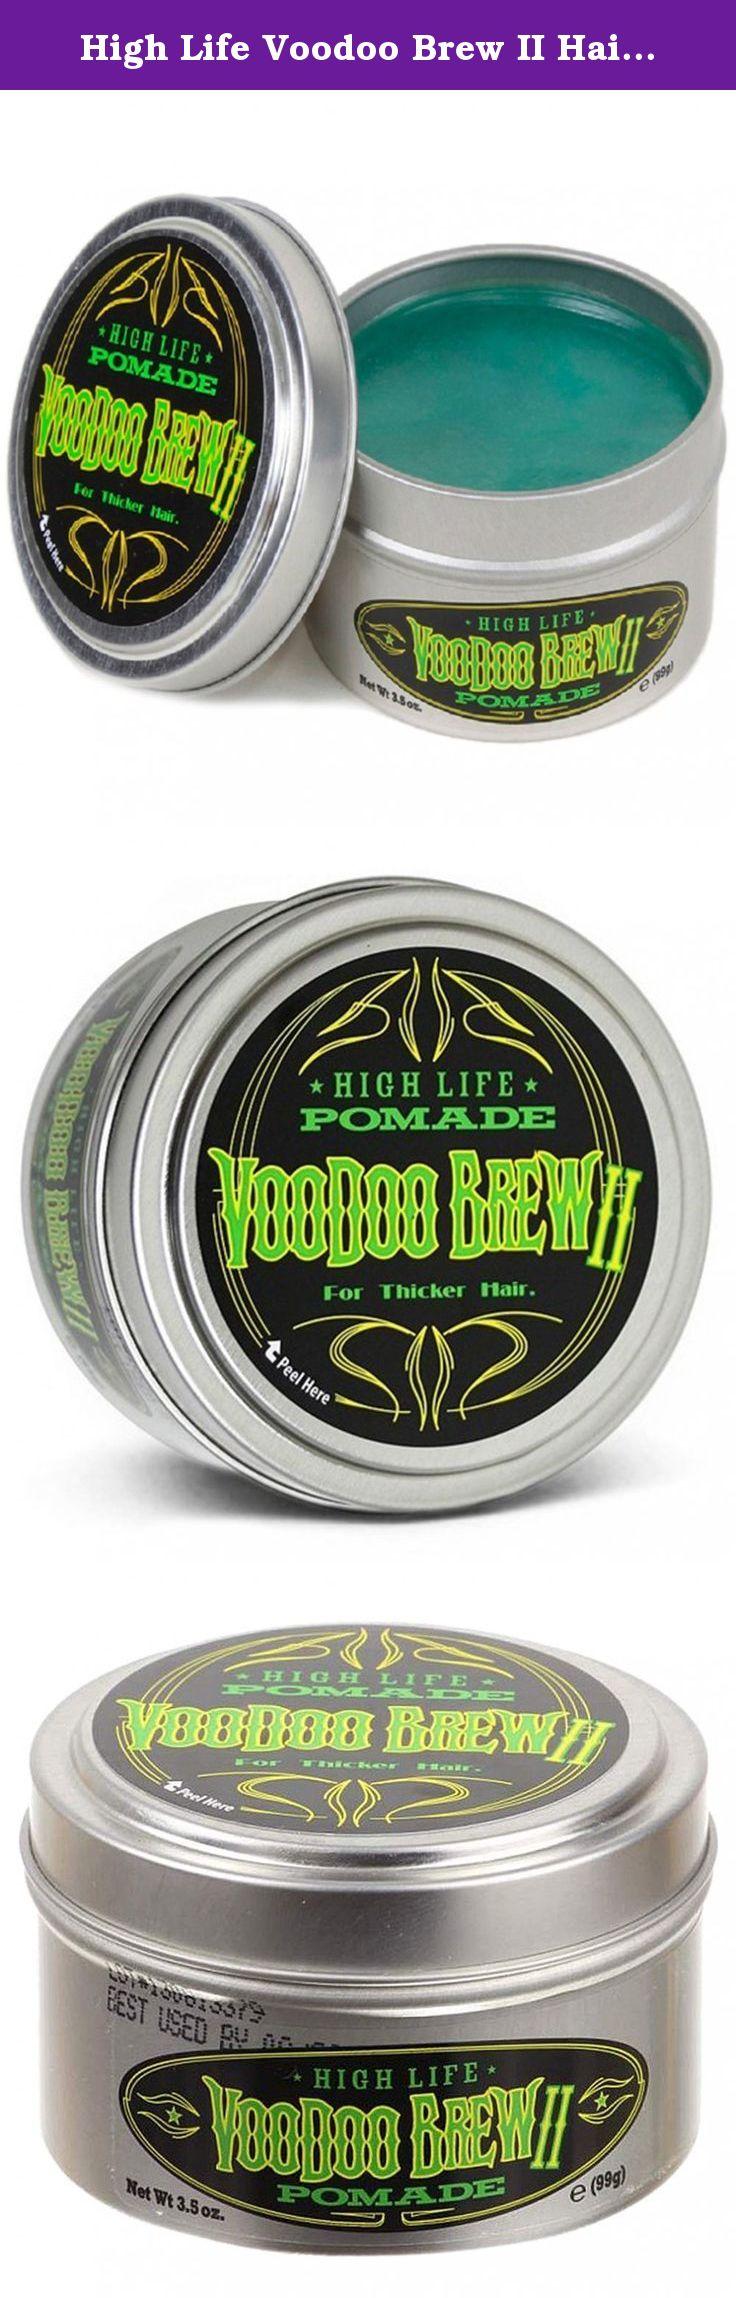 High Life Voodoo Brew Ii Hair Pomade 35oz Spider Heavy